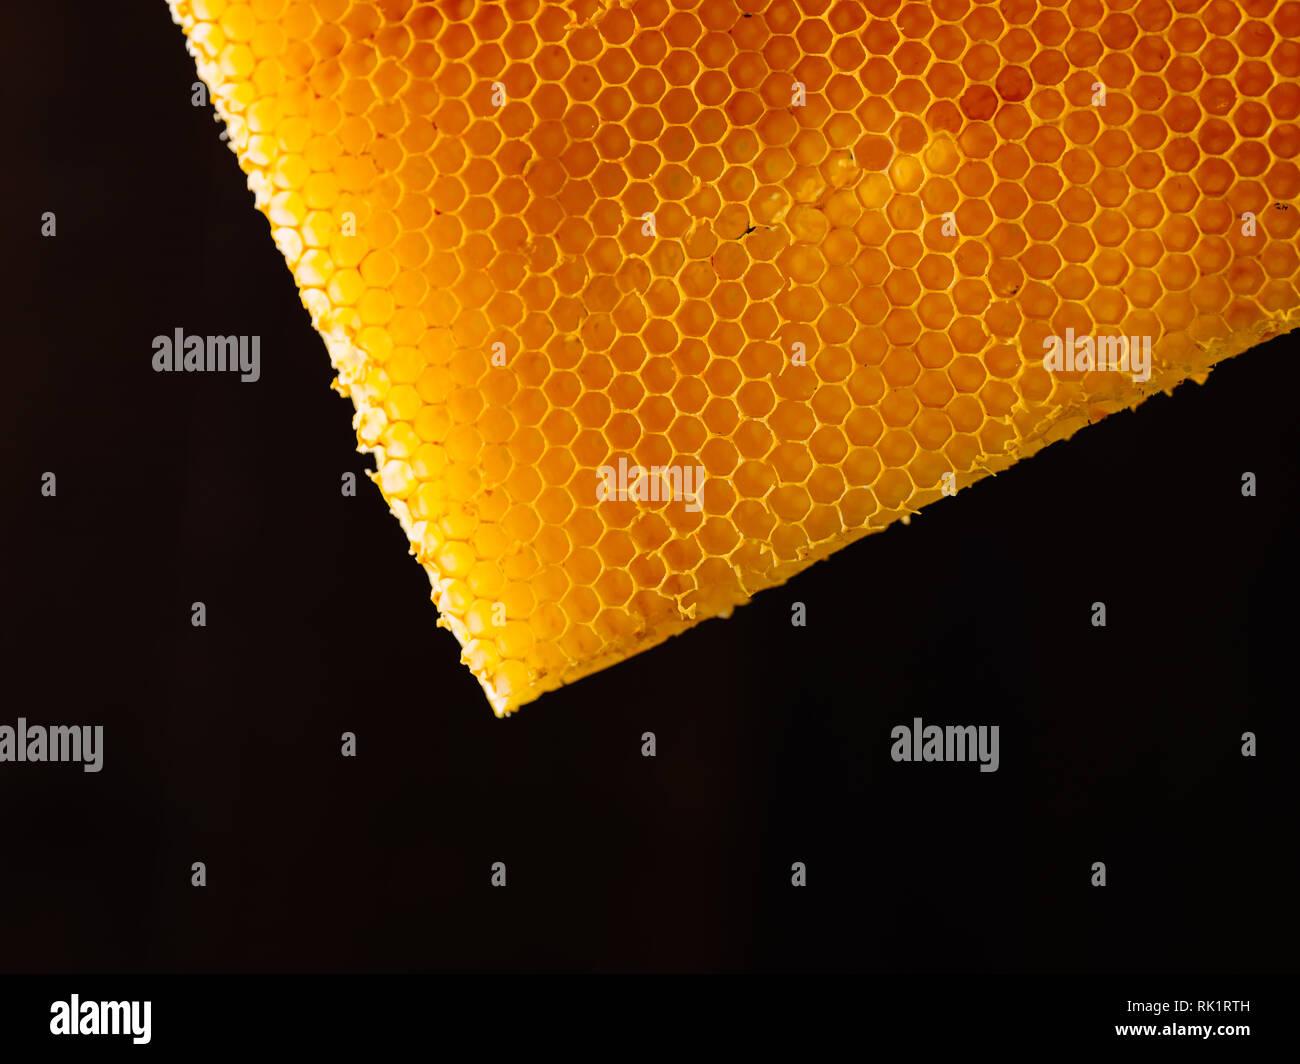 Bee honeycomb close up of isolated on black background - Stock Image